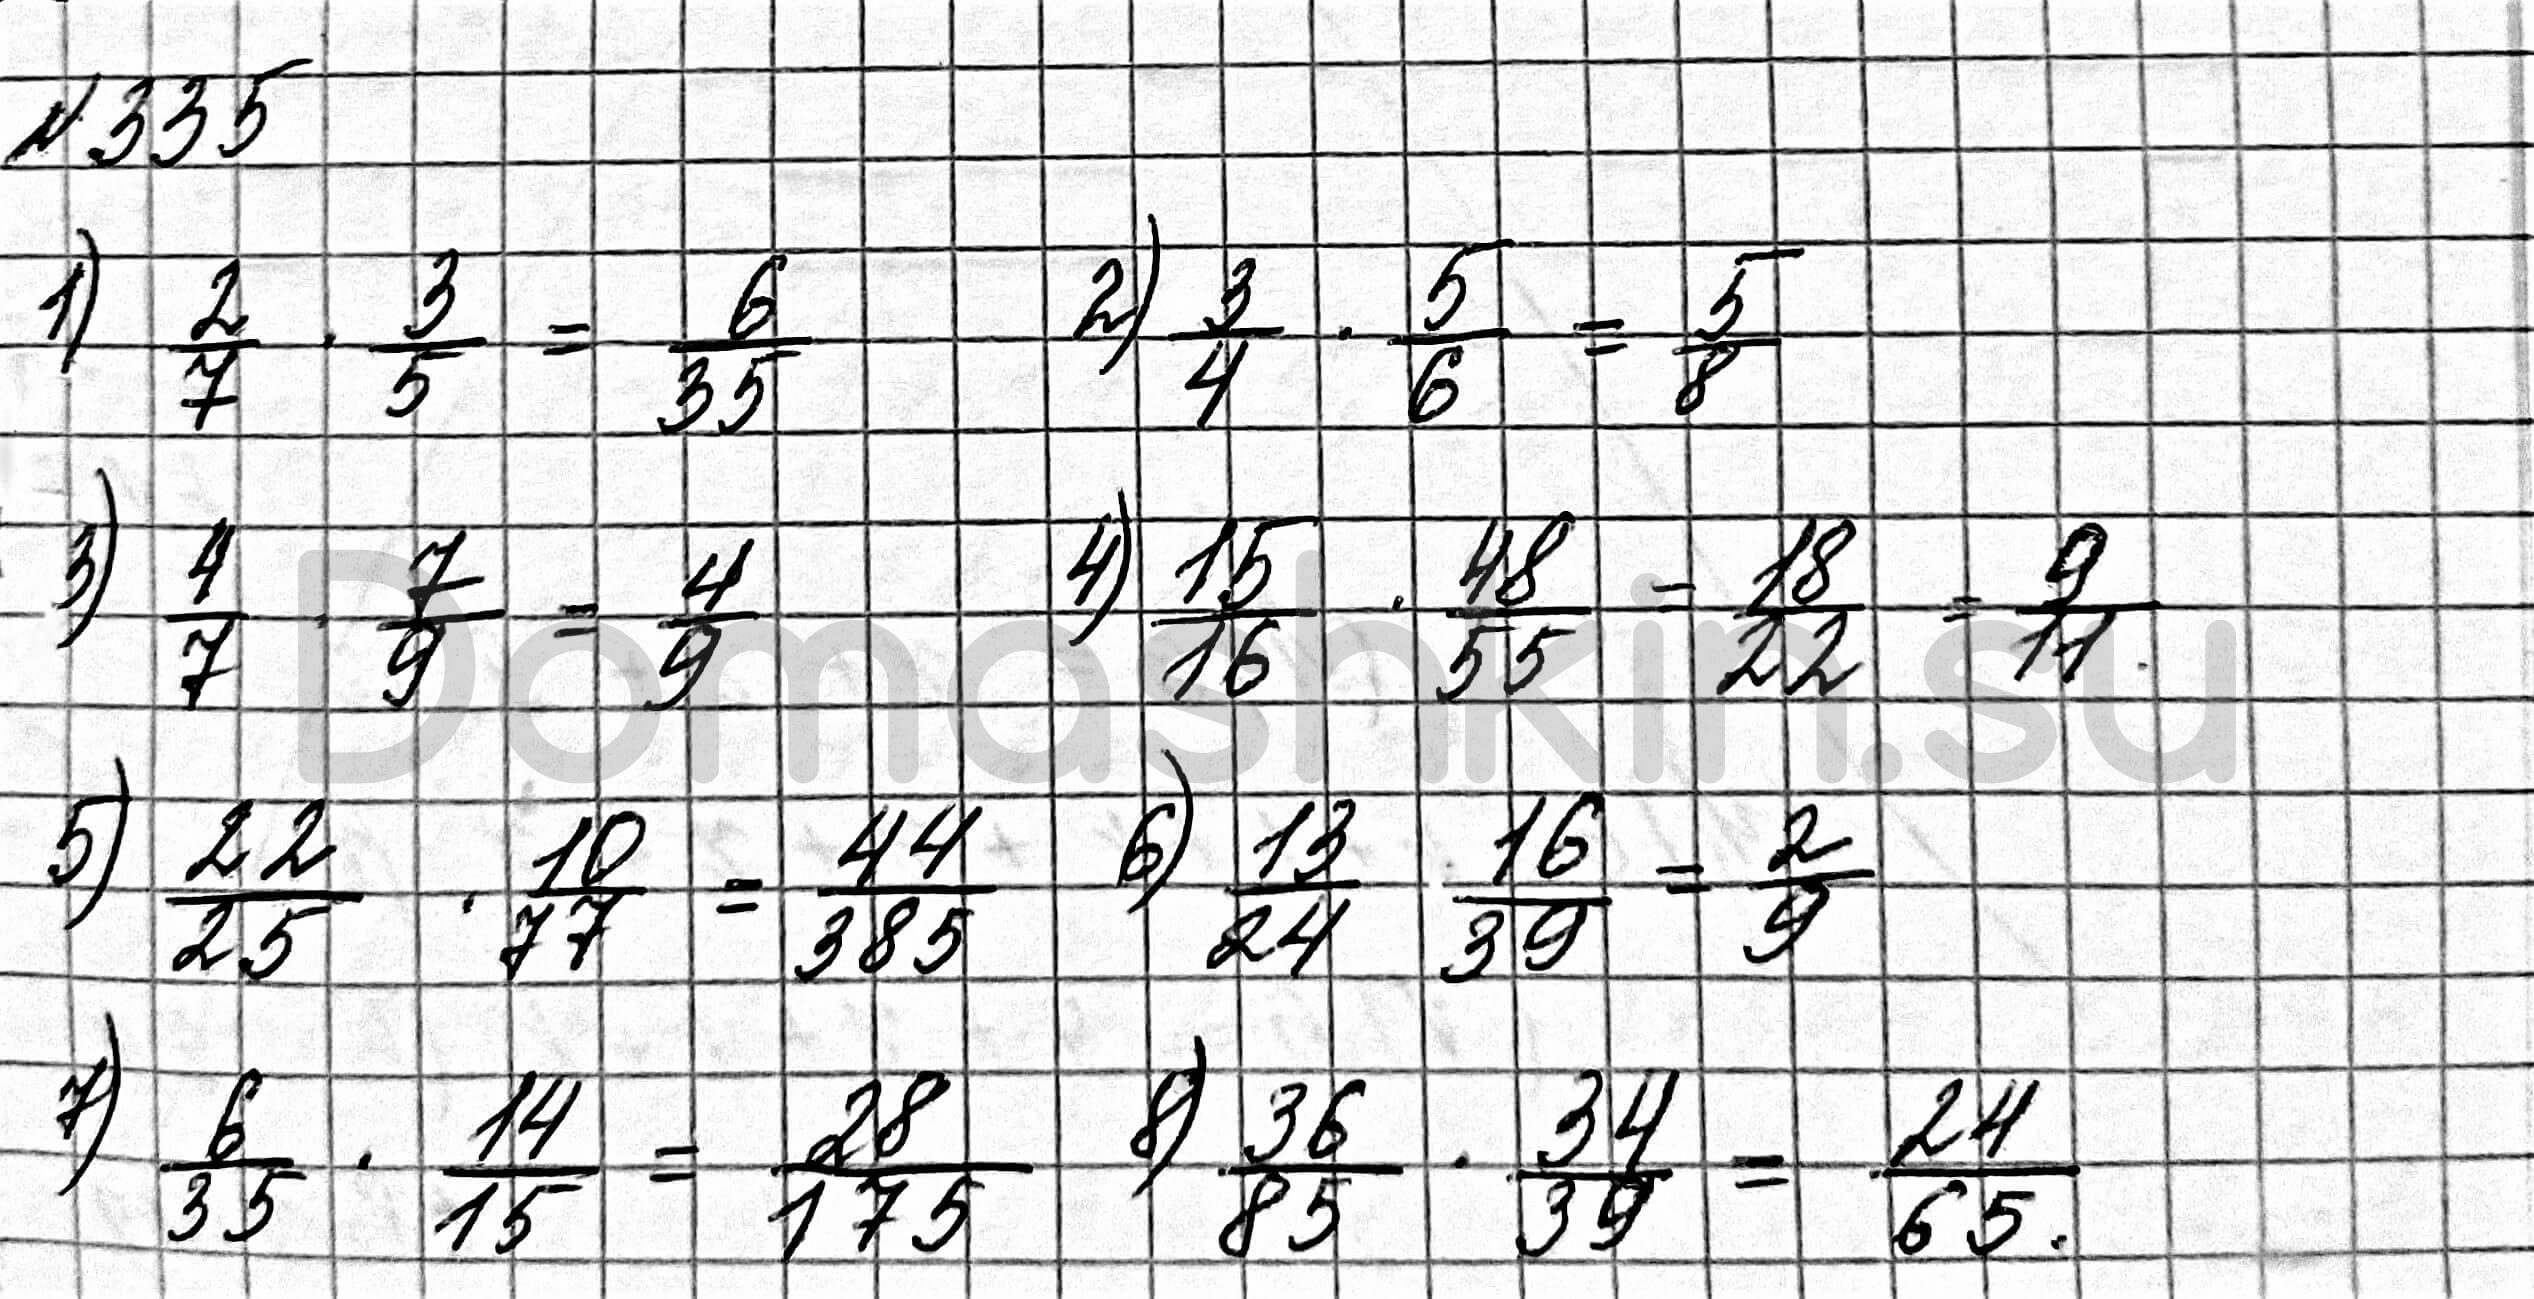 Математика 6 класс учебник Мерзляк номер 335 решение